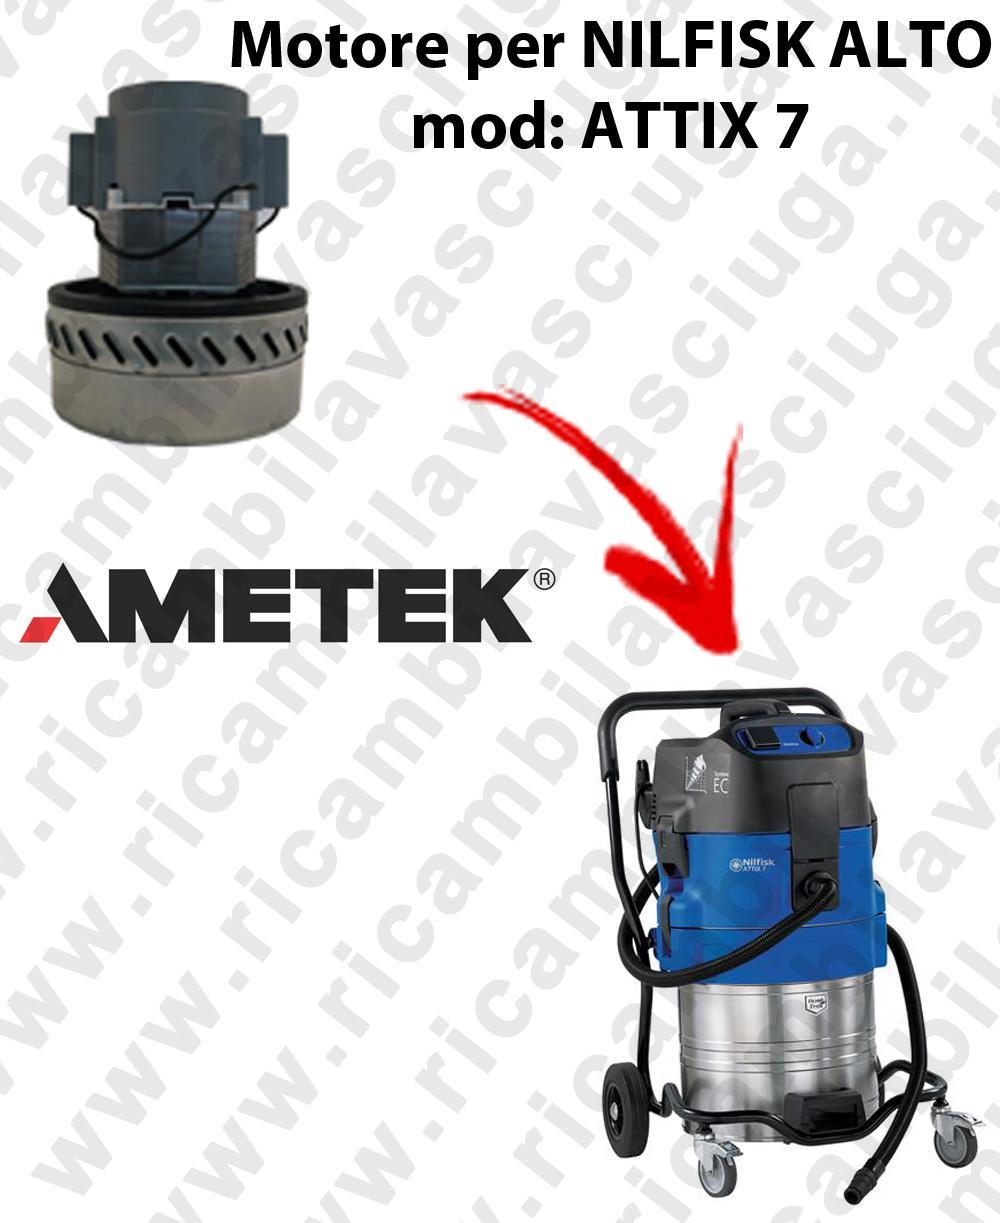 Motore aspirazione AMETEK  per aspirapolvere ATTIX 7-  NILFISK ALTO